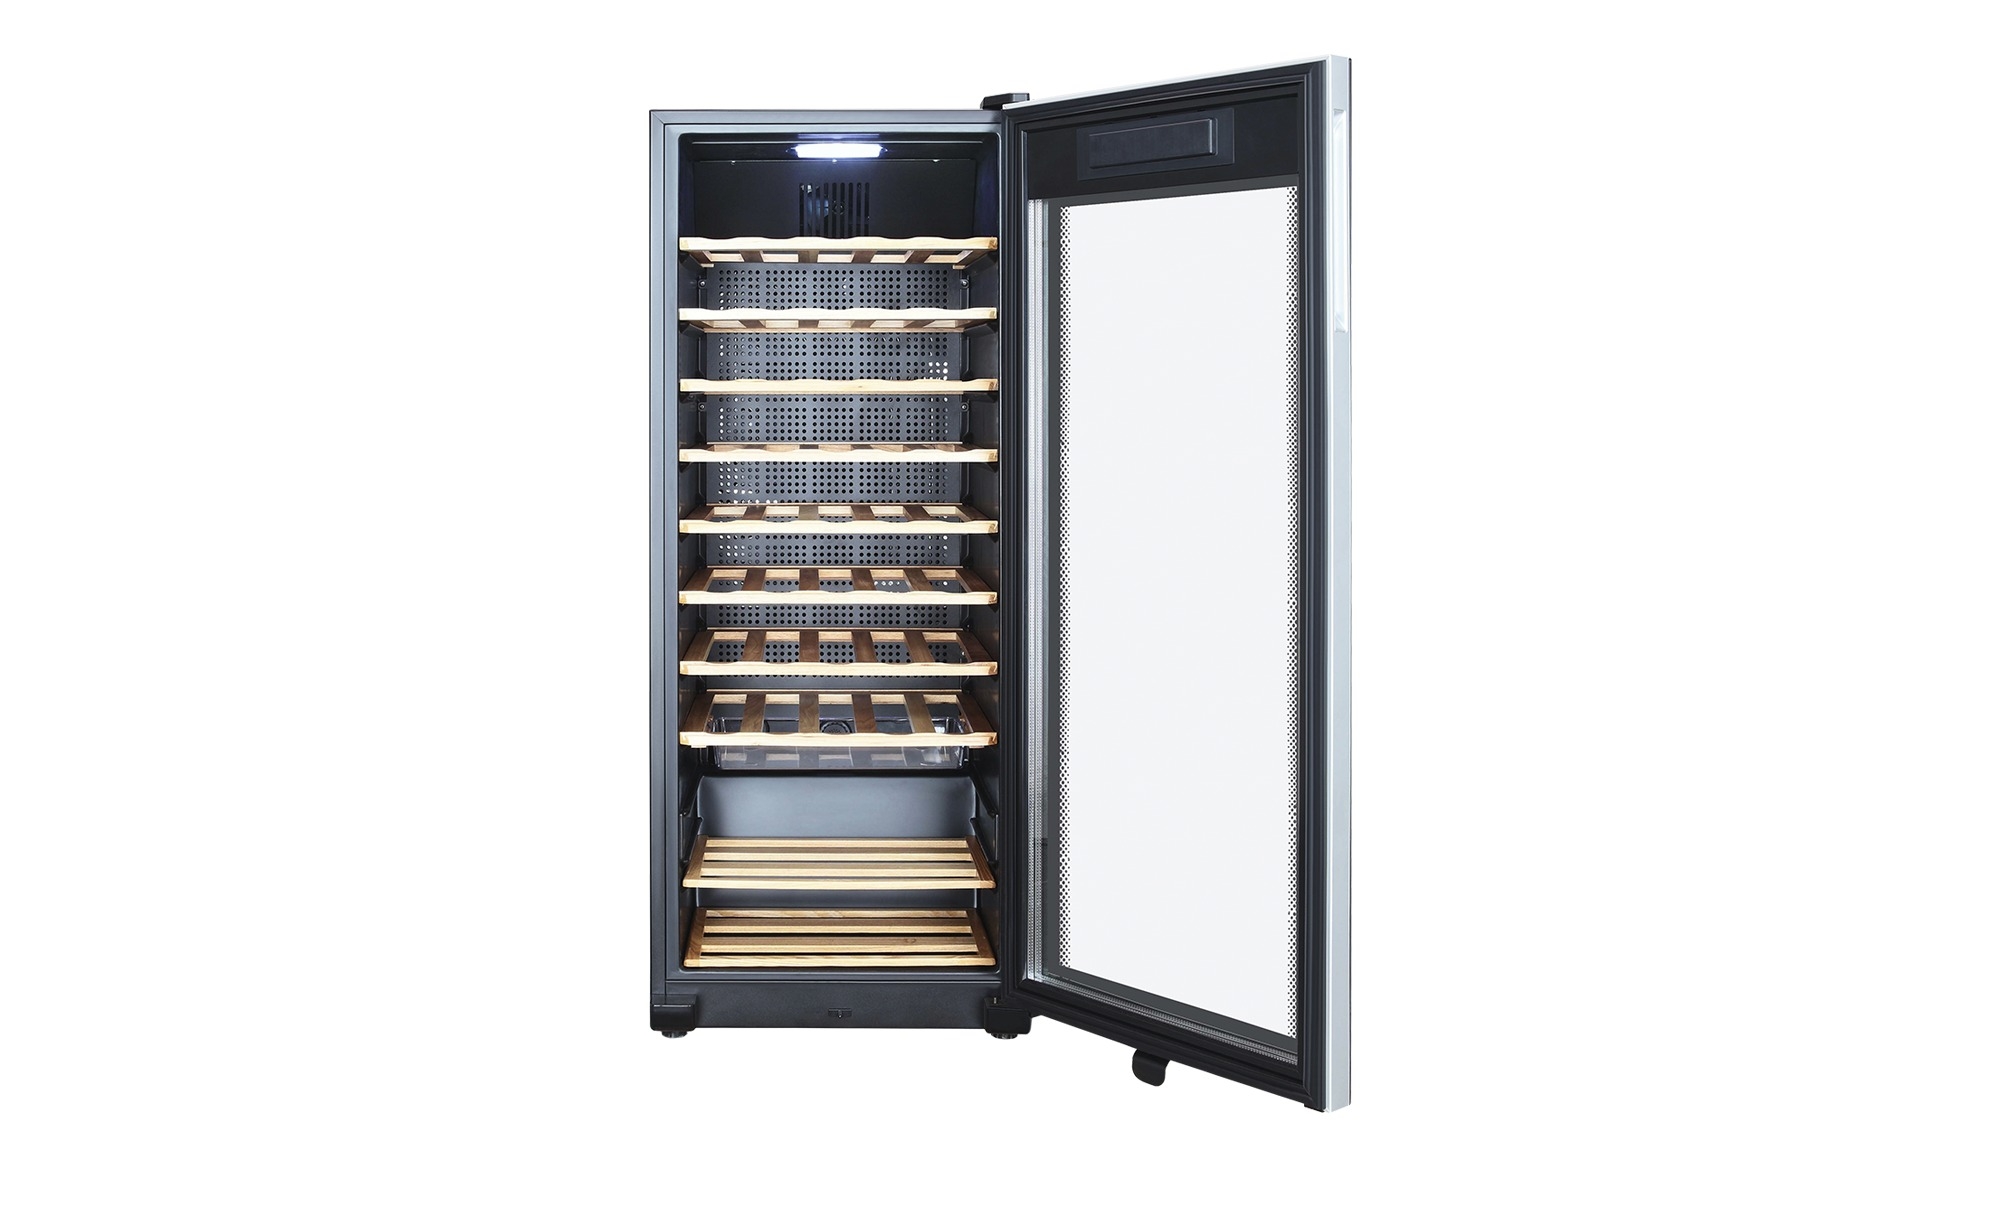 Kühlschrank Haier : Haier kühl gefrier kombination c fe cwj lidl